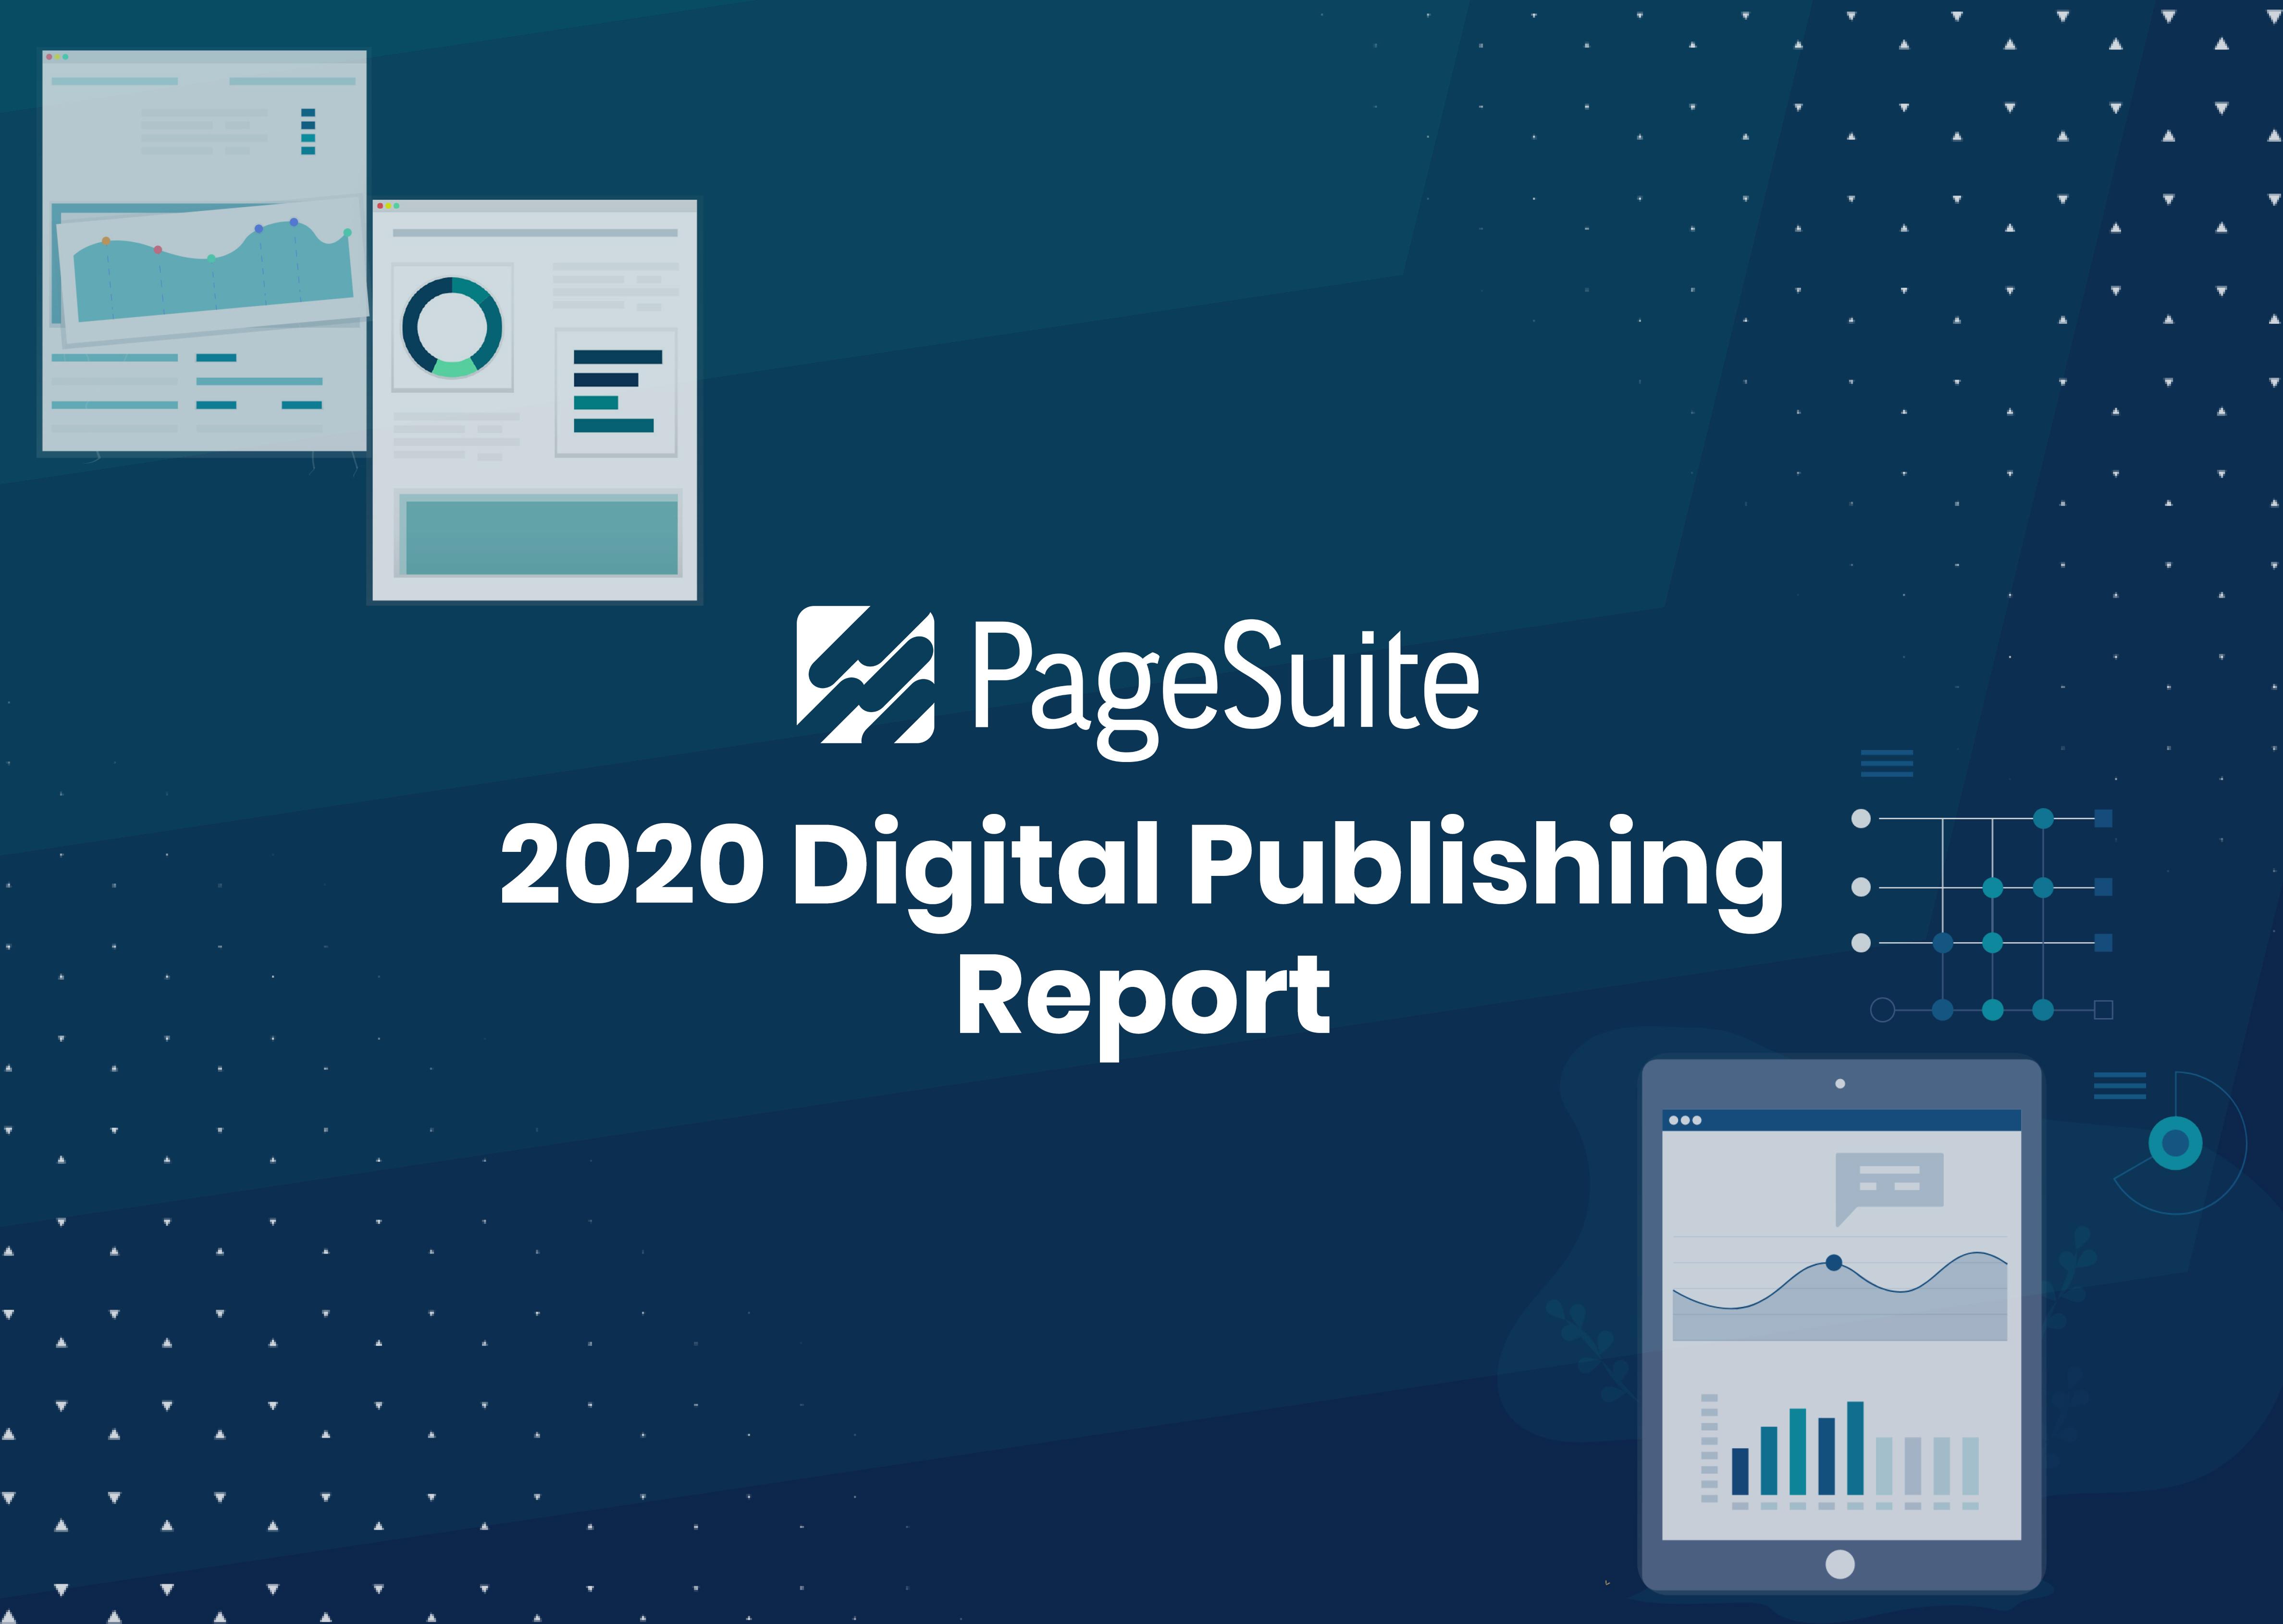 2020 Report